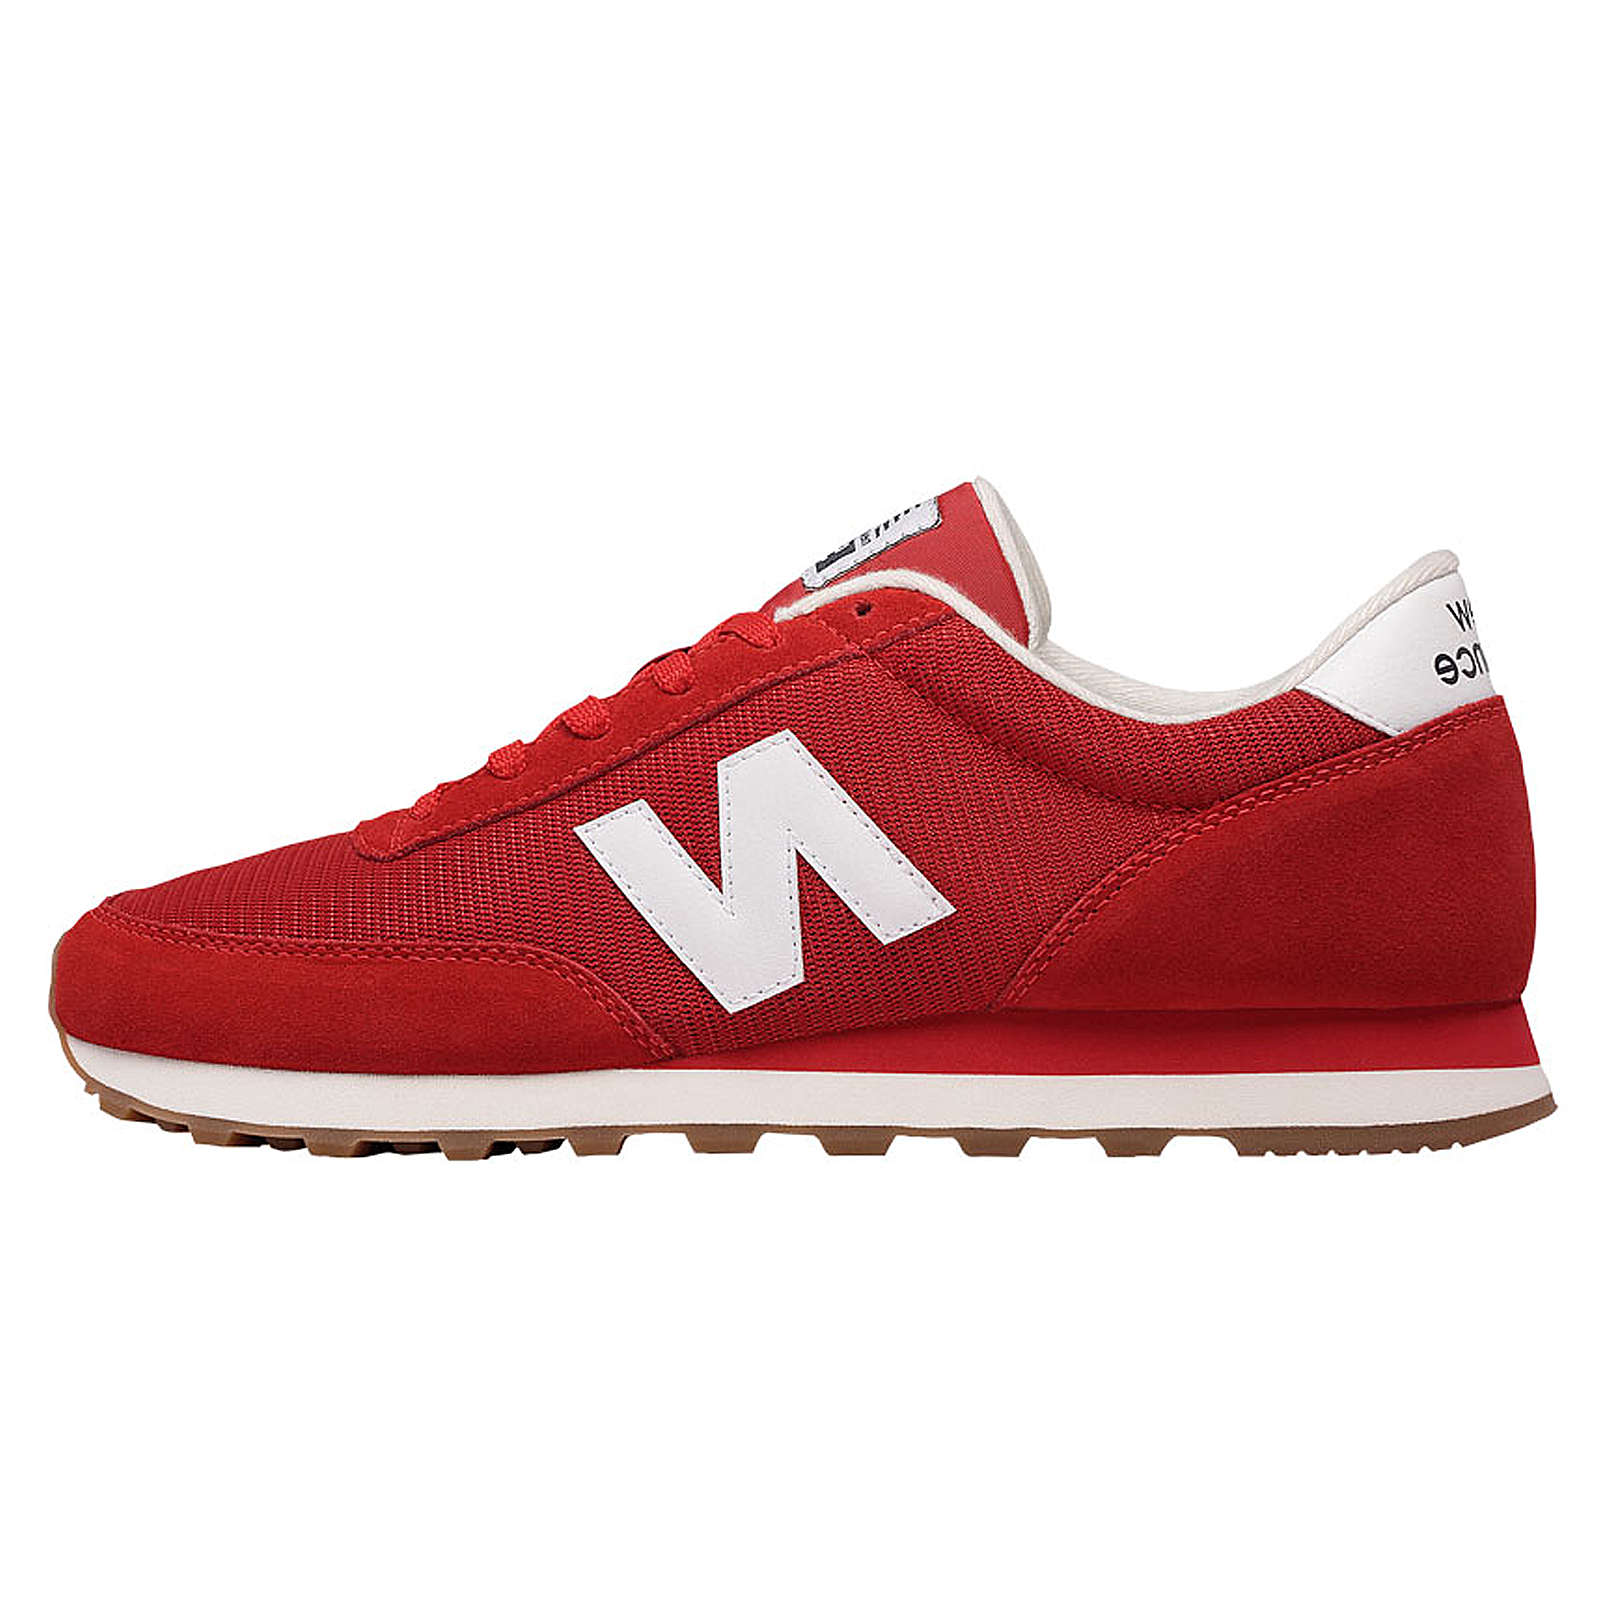 New Balance ML501CVB Sneakers Low rot/weiß Herren Gr. 40,5